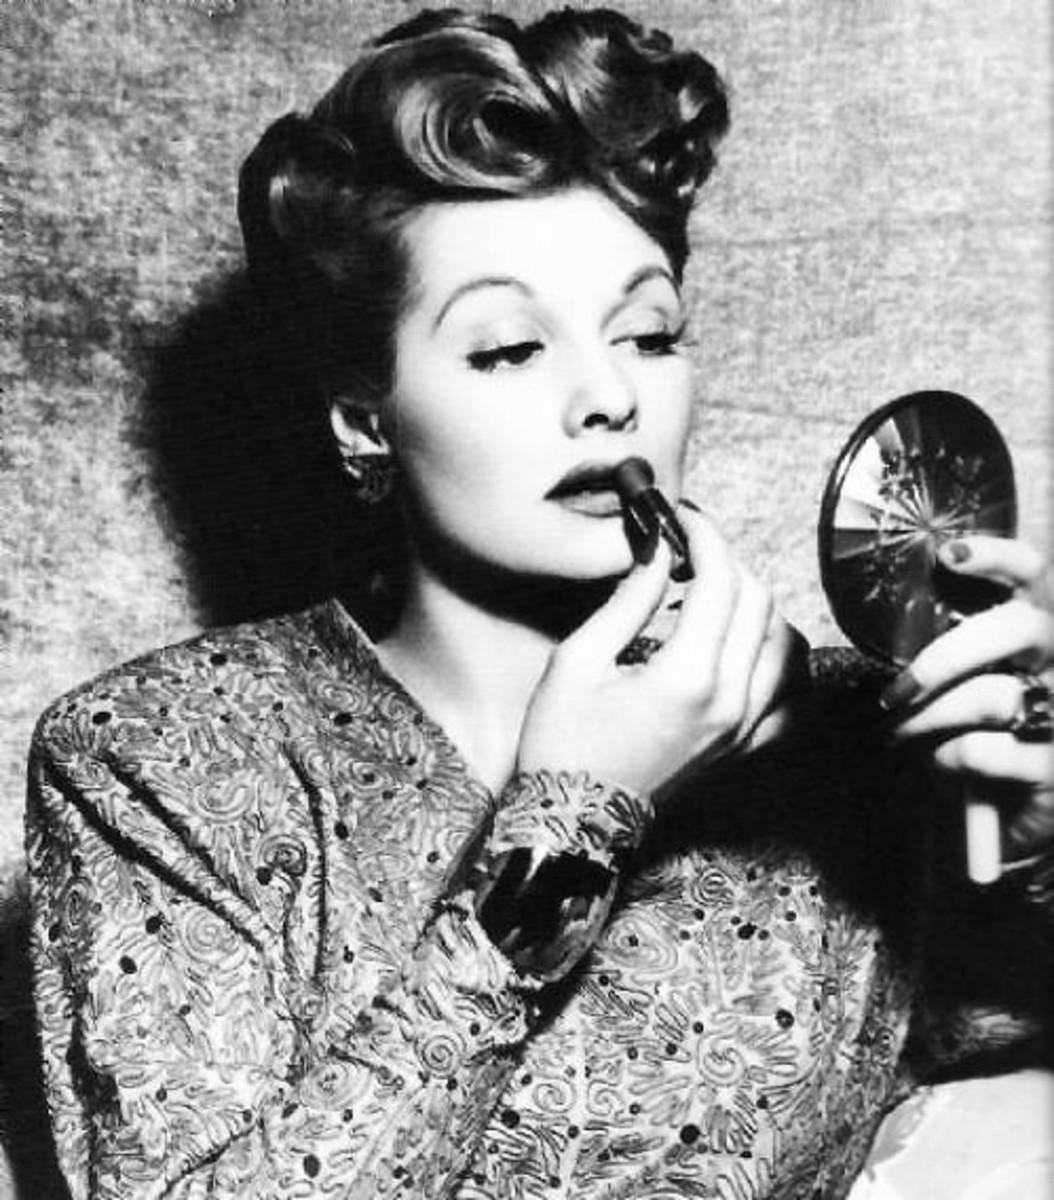 Lucy retouches lipstick